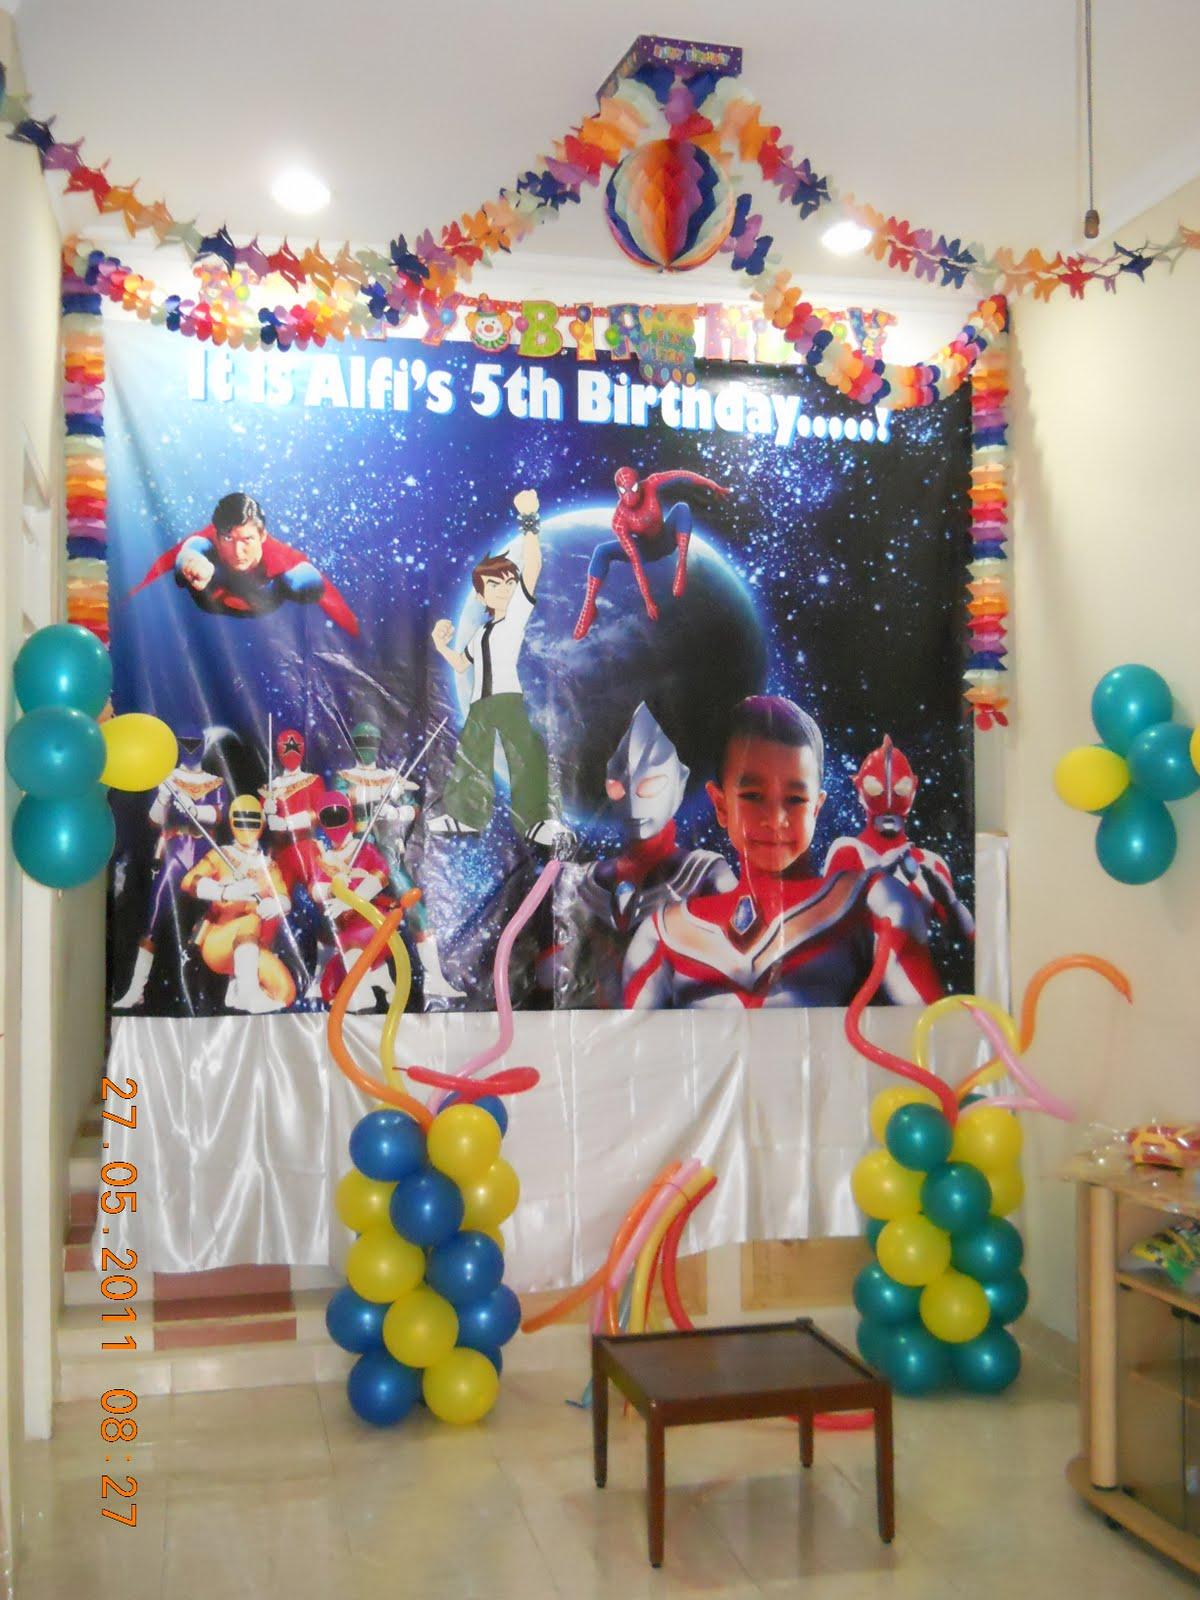 Pin Kue Ulang Tahun Anak Surabaya Cake On Pinterest